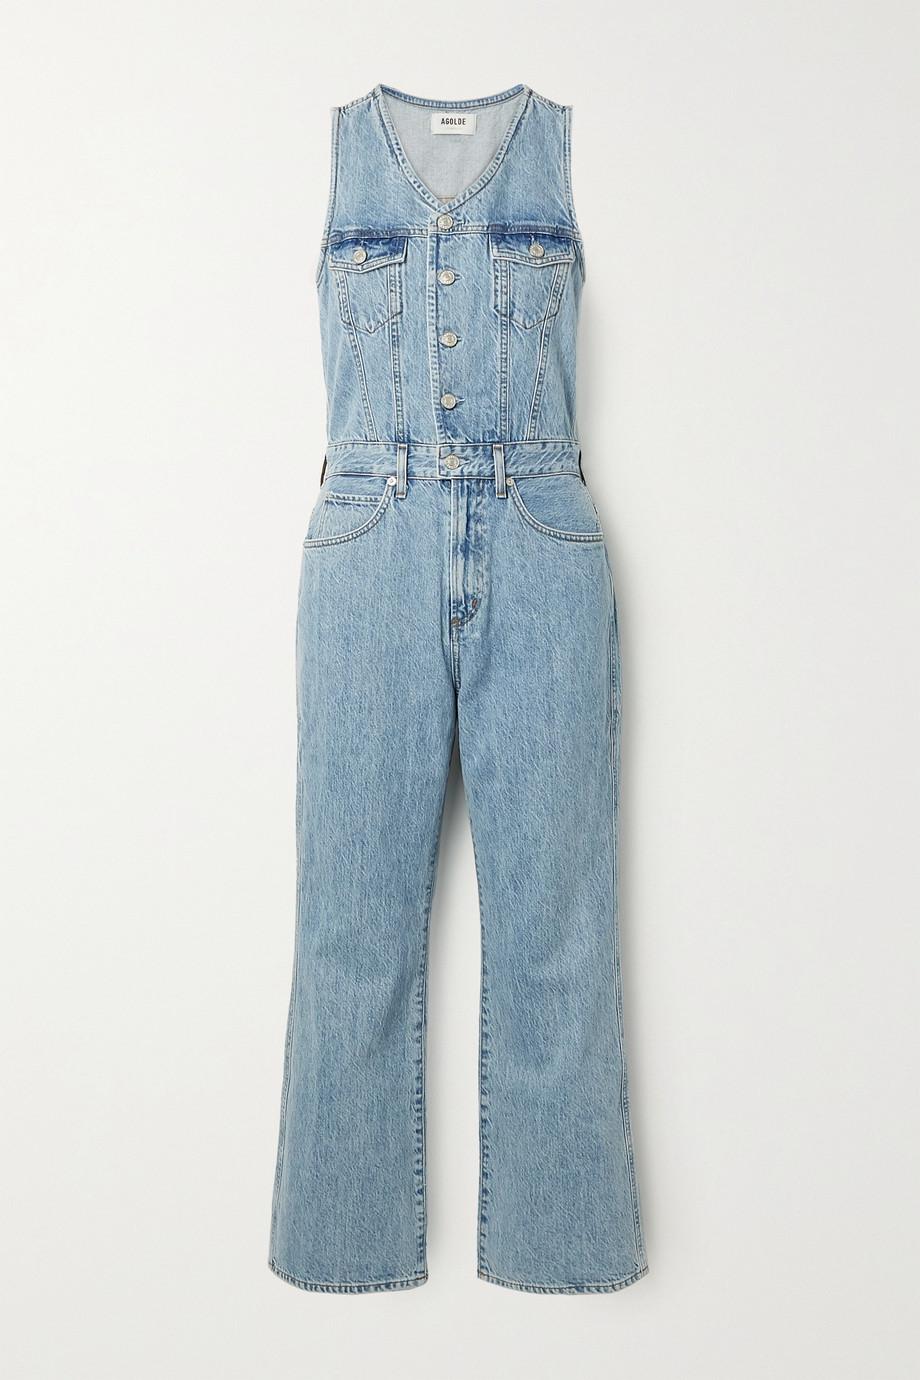 AGOLDE '70s 牛仔连身裤